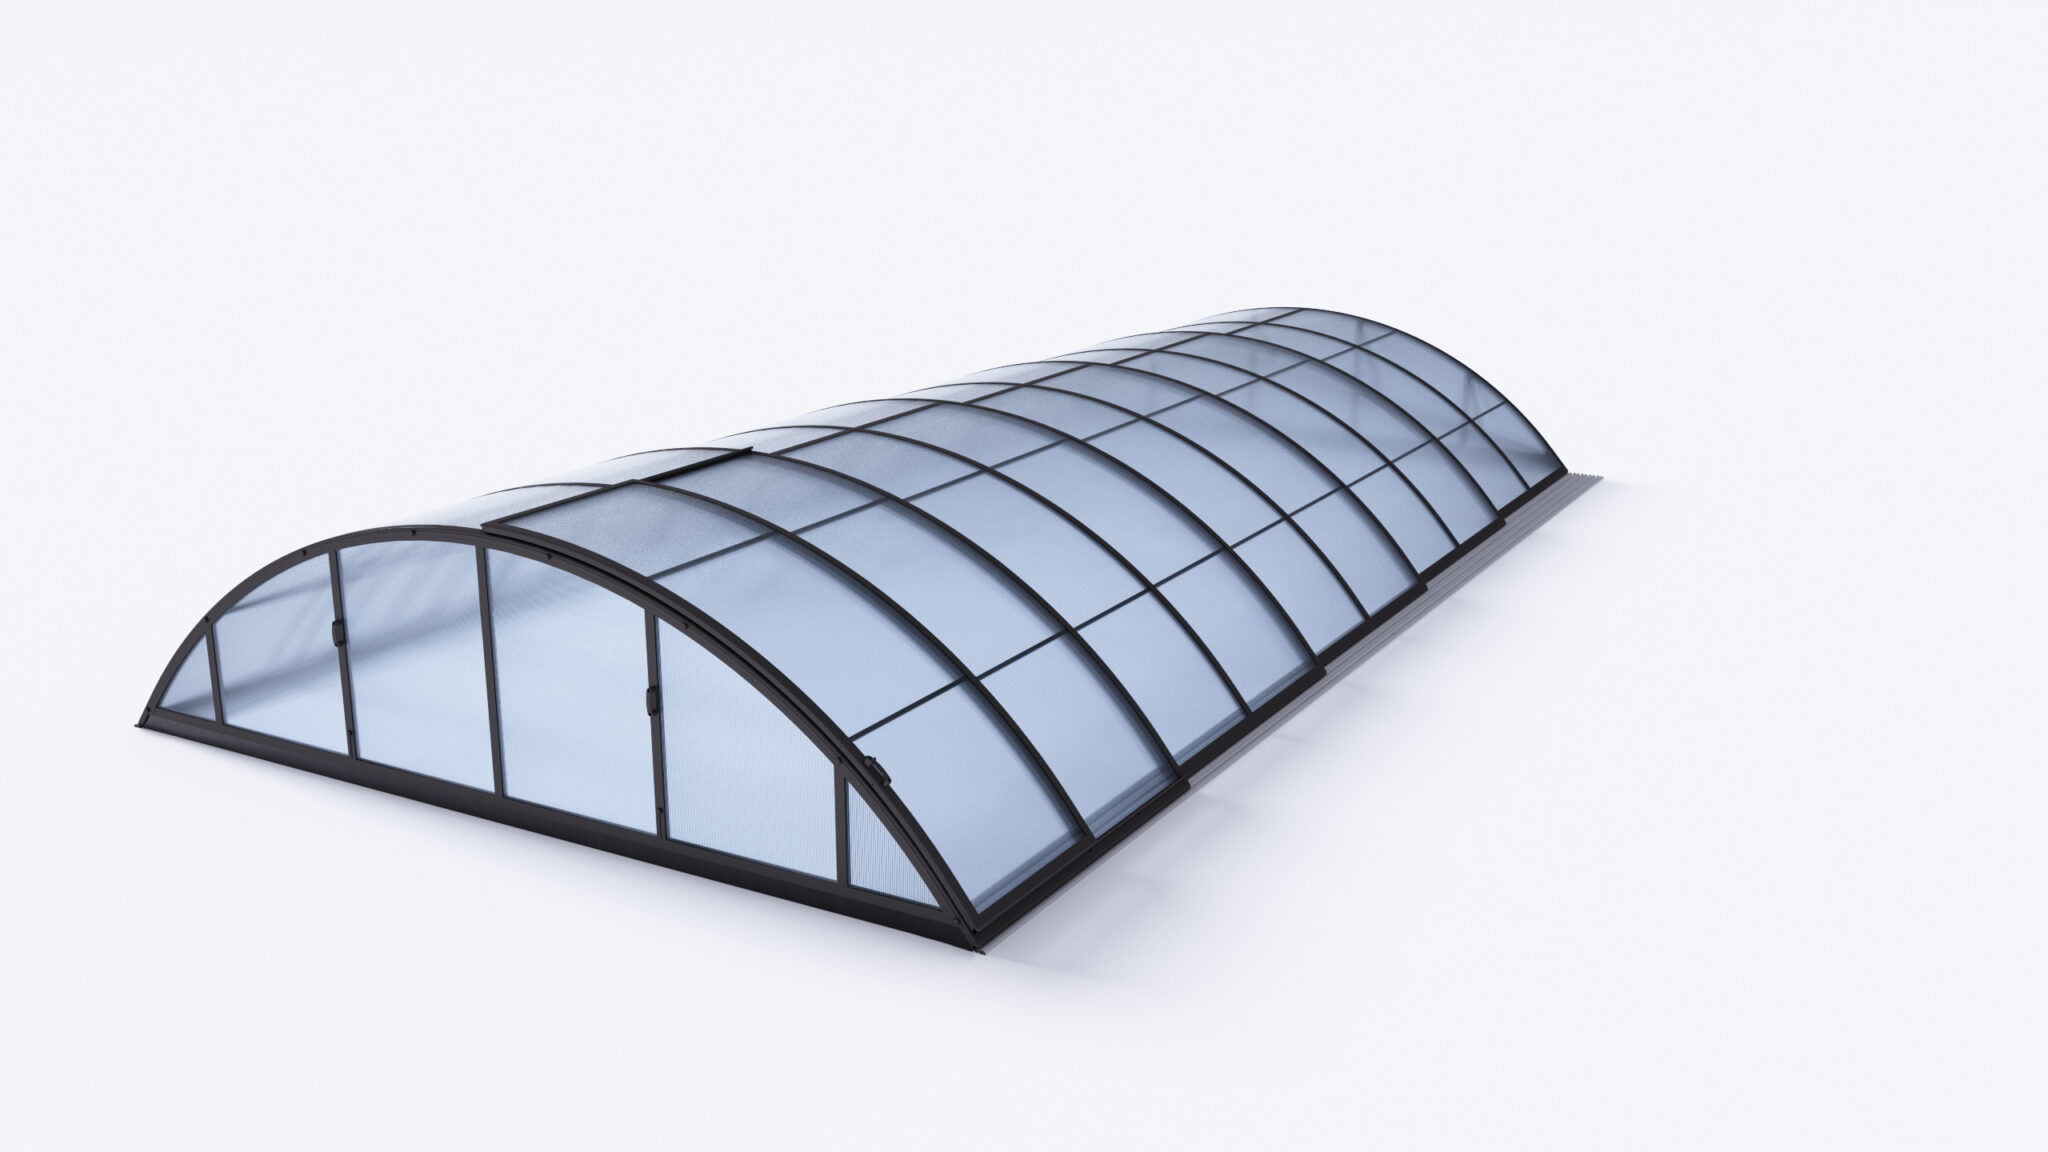 Baseino uždengimas KLASIK-A, DB703 (333-361 x 646 x 100 cm), baseinas max. 319 x 635 cm